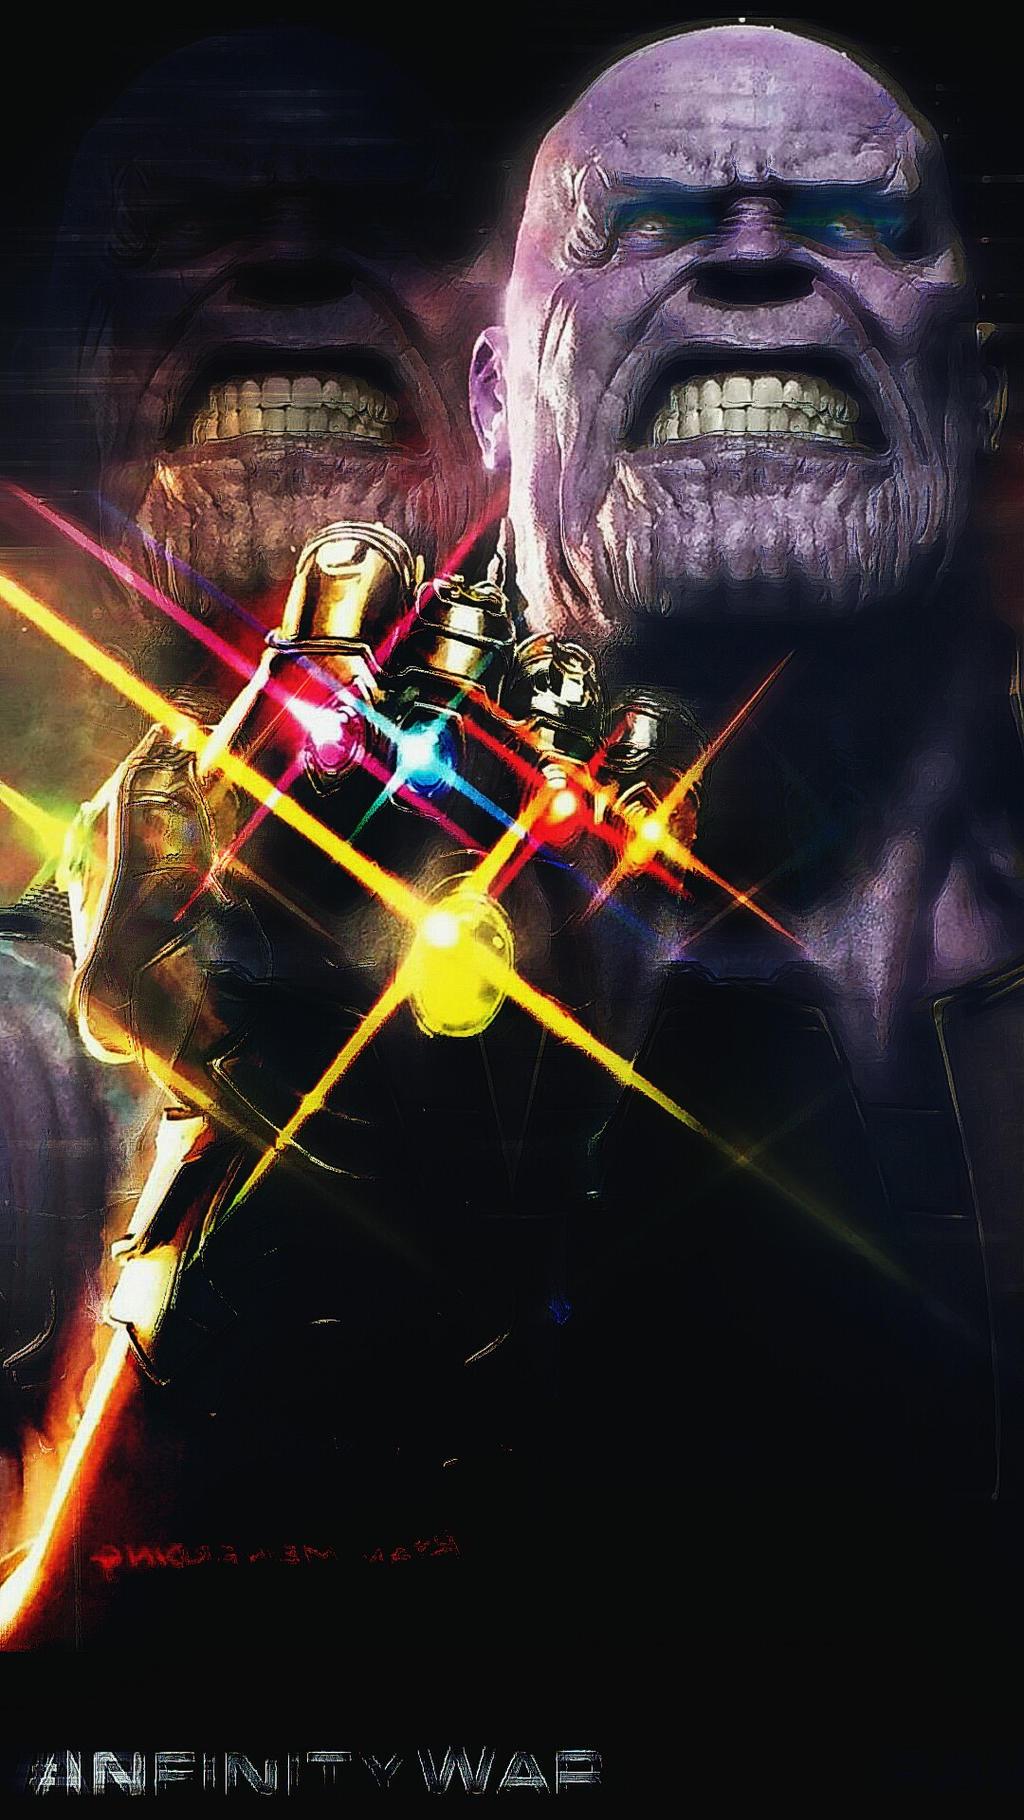 INFINITY WAR/Thanos Concept Art  by Korkmaz0648